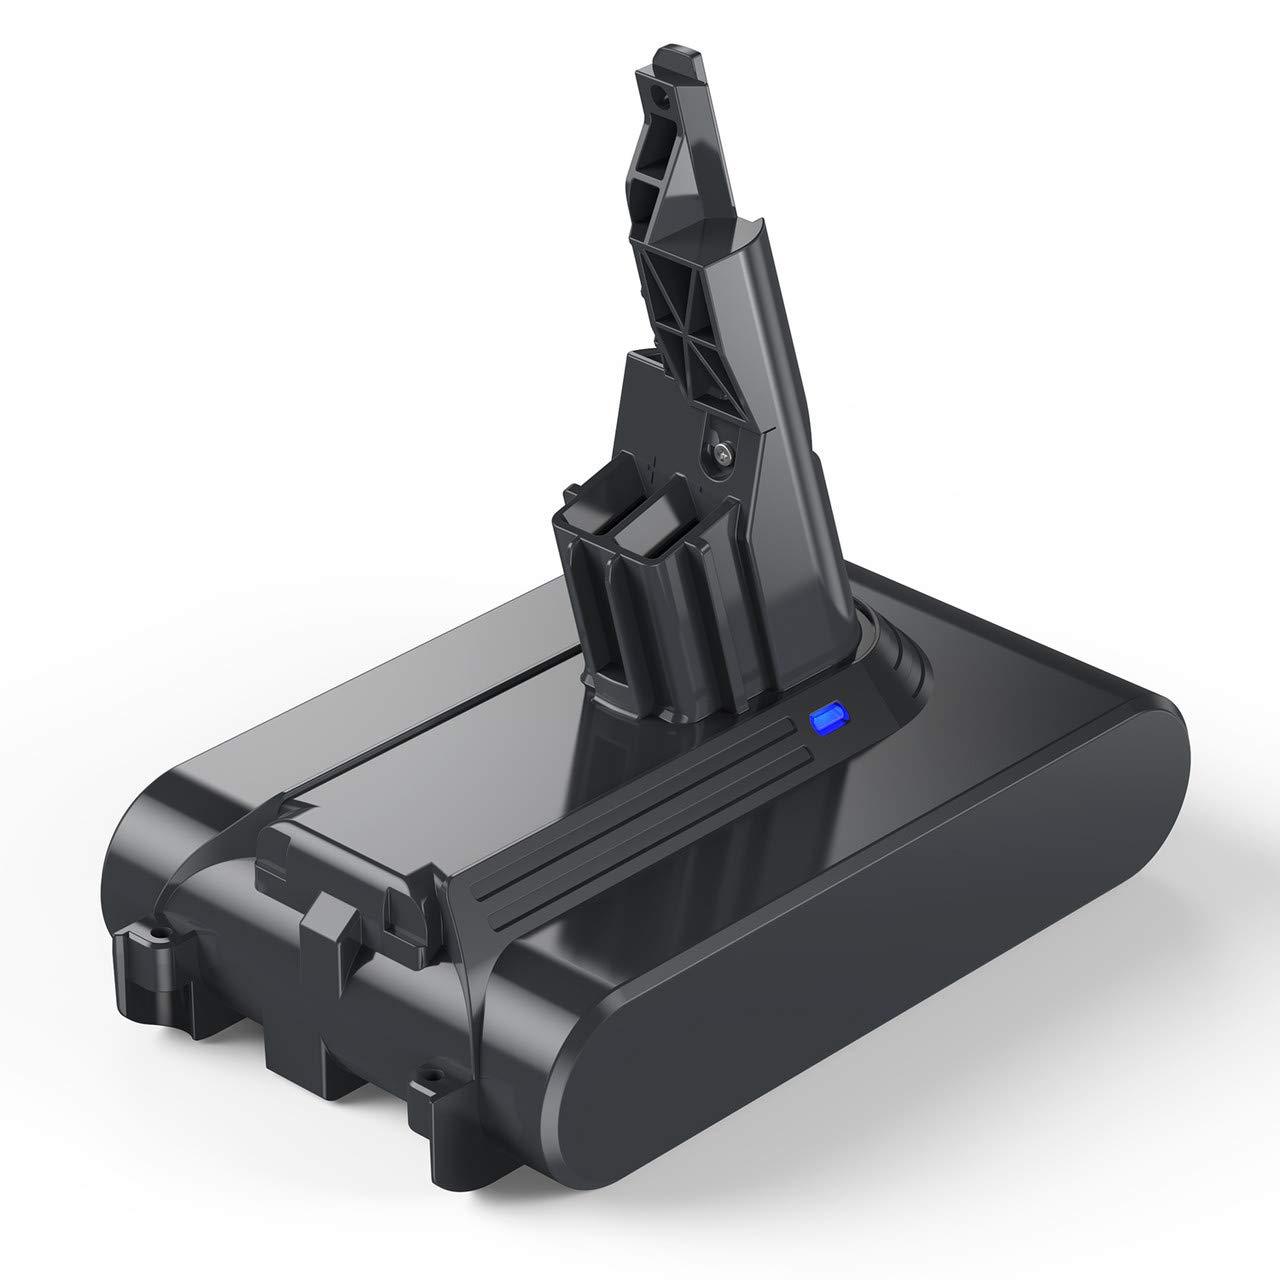 Powerextra 3500mAh Compatible with Dyson V7 Battery 21.6V Lithium ion for Dyson V7 Handheld Vacuum Cleaners Cordless V7 Animal for Dyson 21.6 Volt Battery V7 HEPA Motorhead Pro V7 Trigger V7 Car+Boat